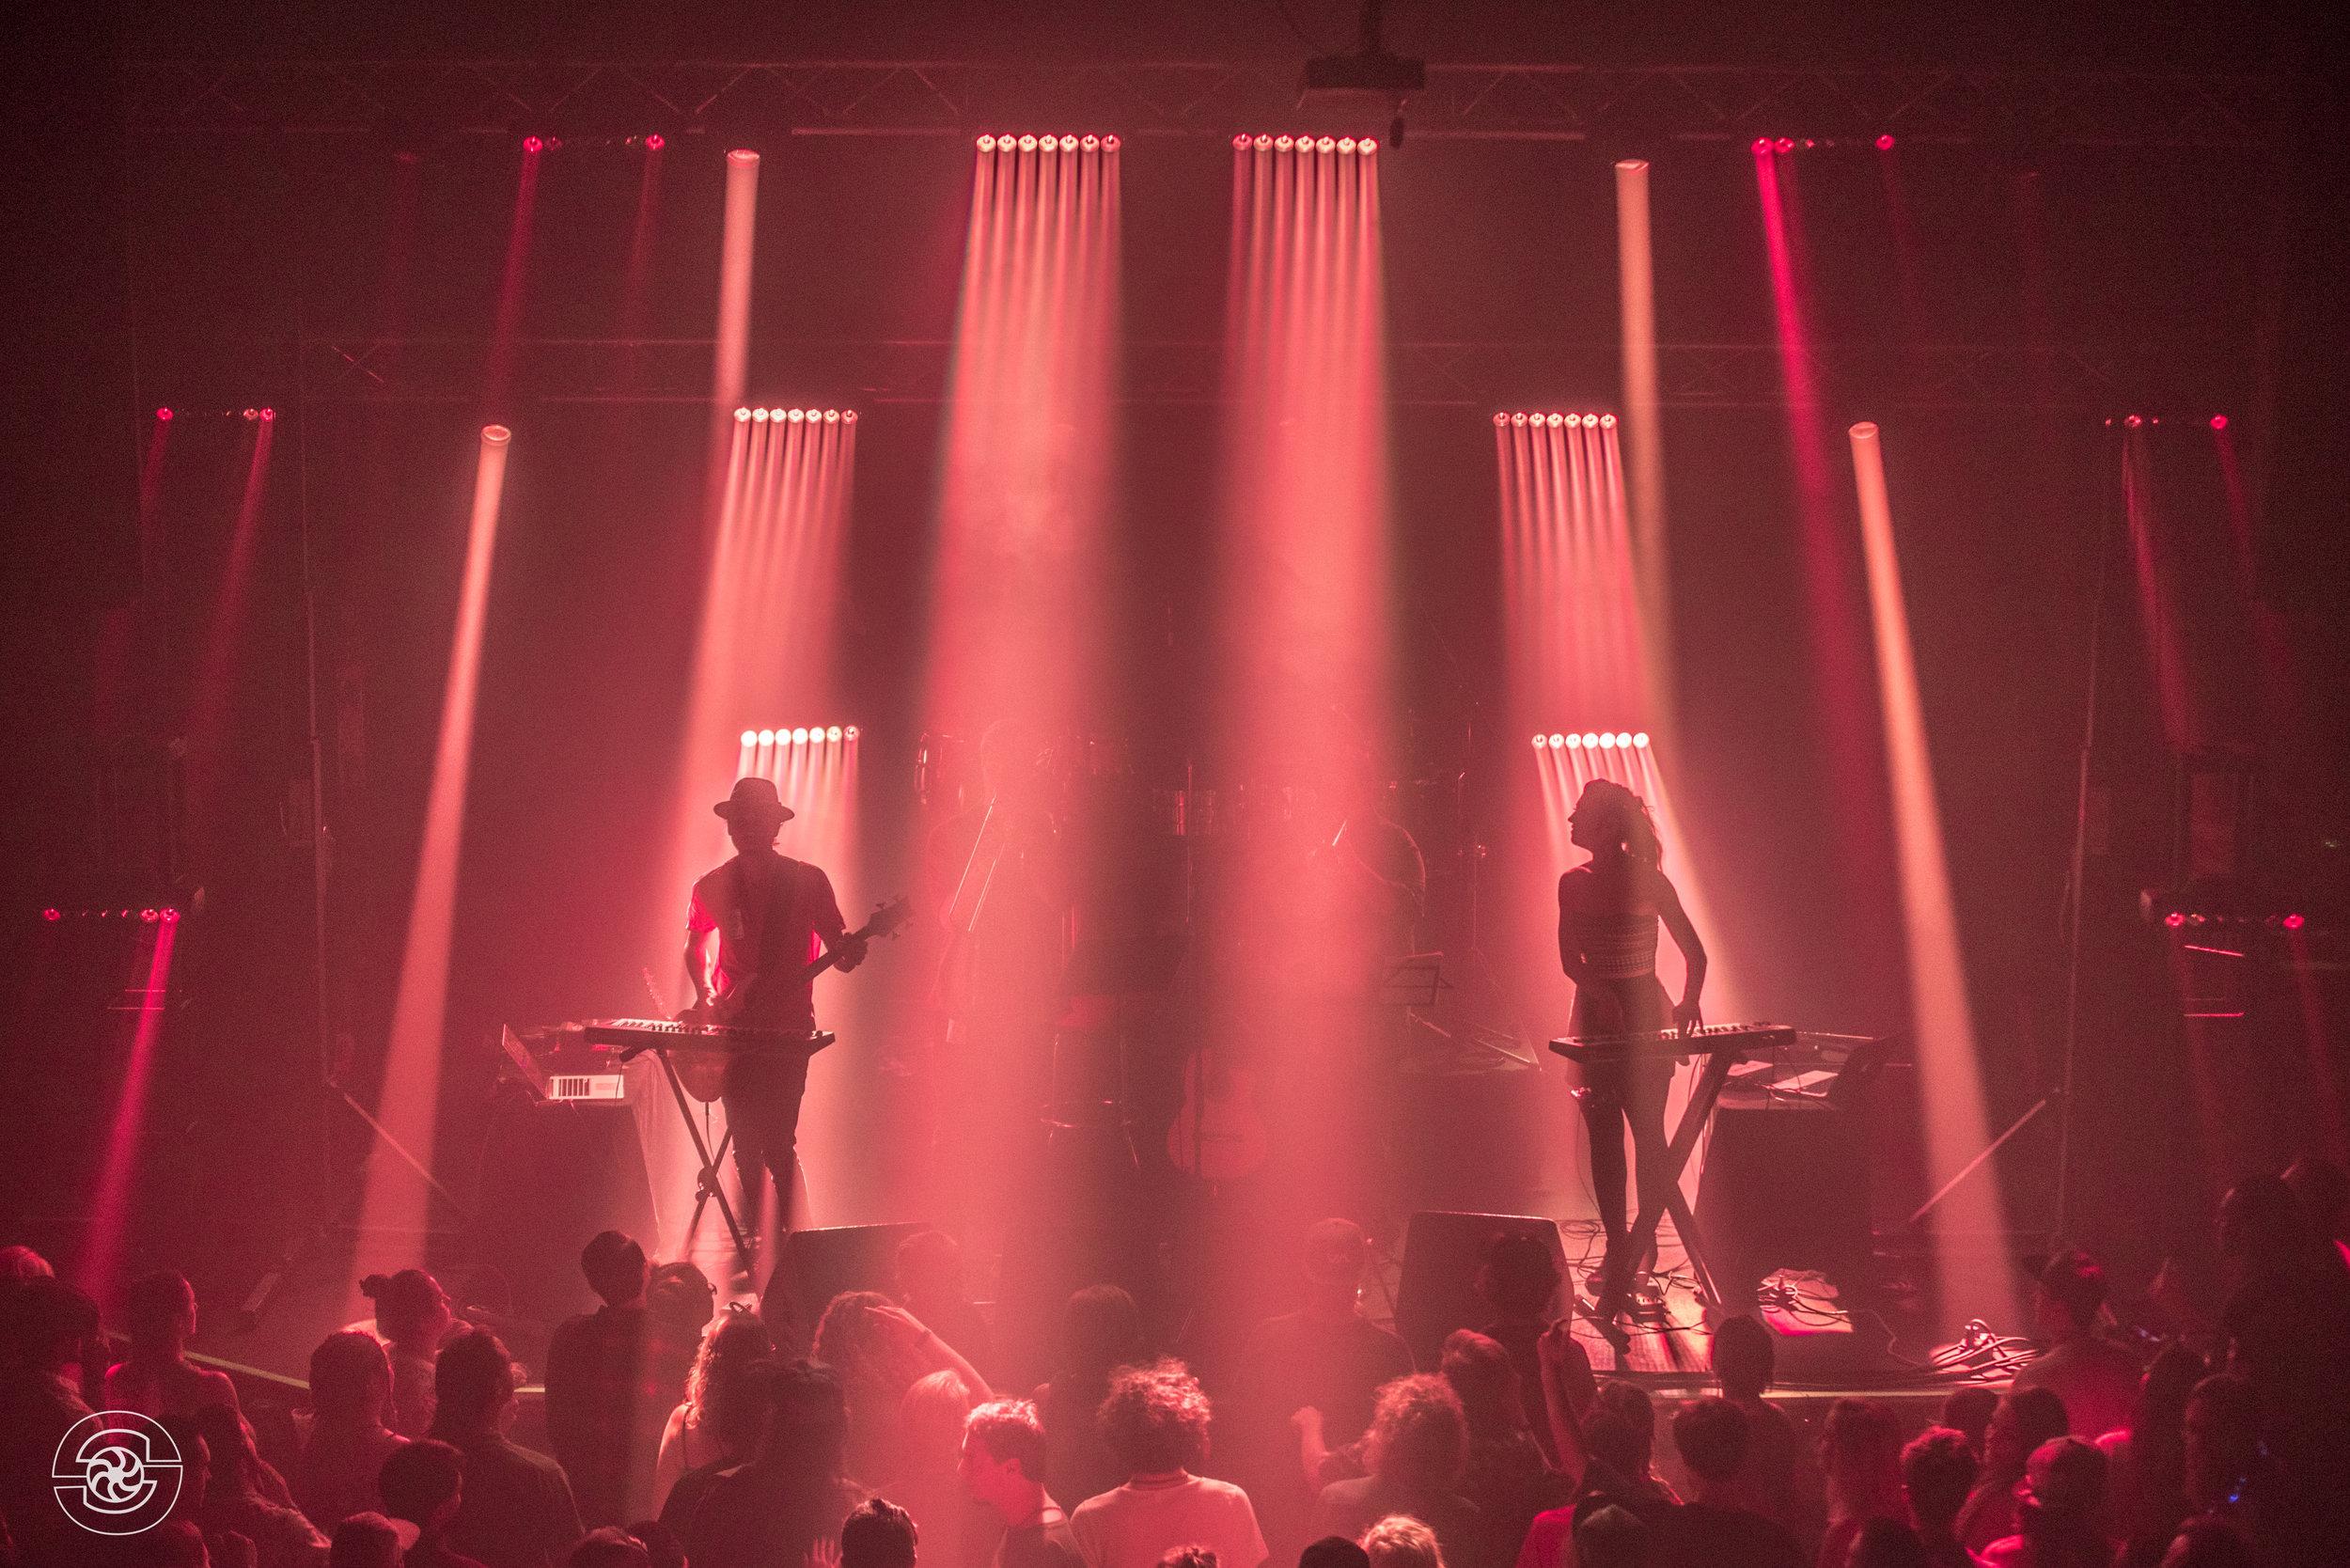 Spectacle.Music.FoxTheatre.2.silkyshots.jpg